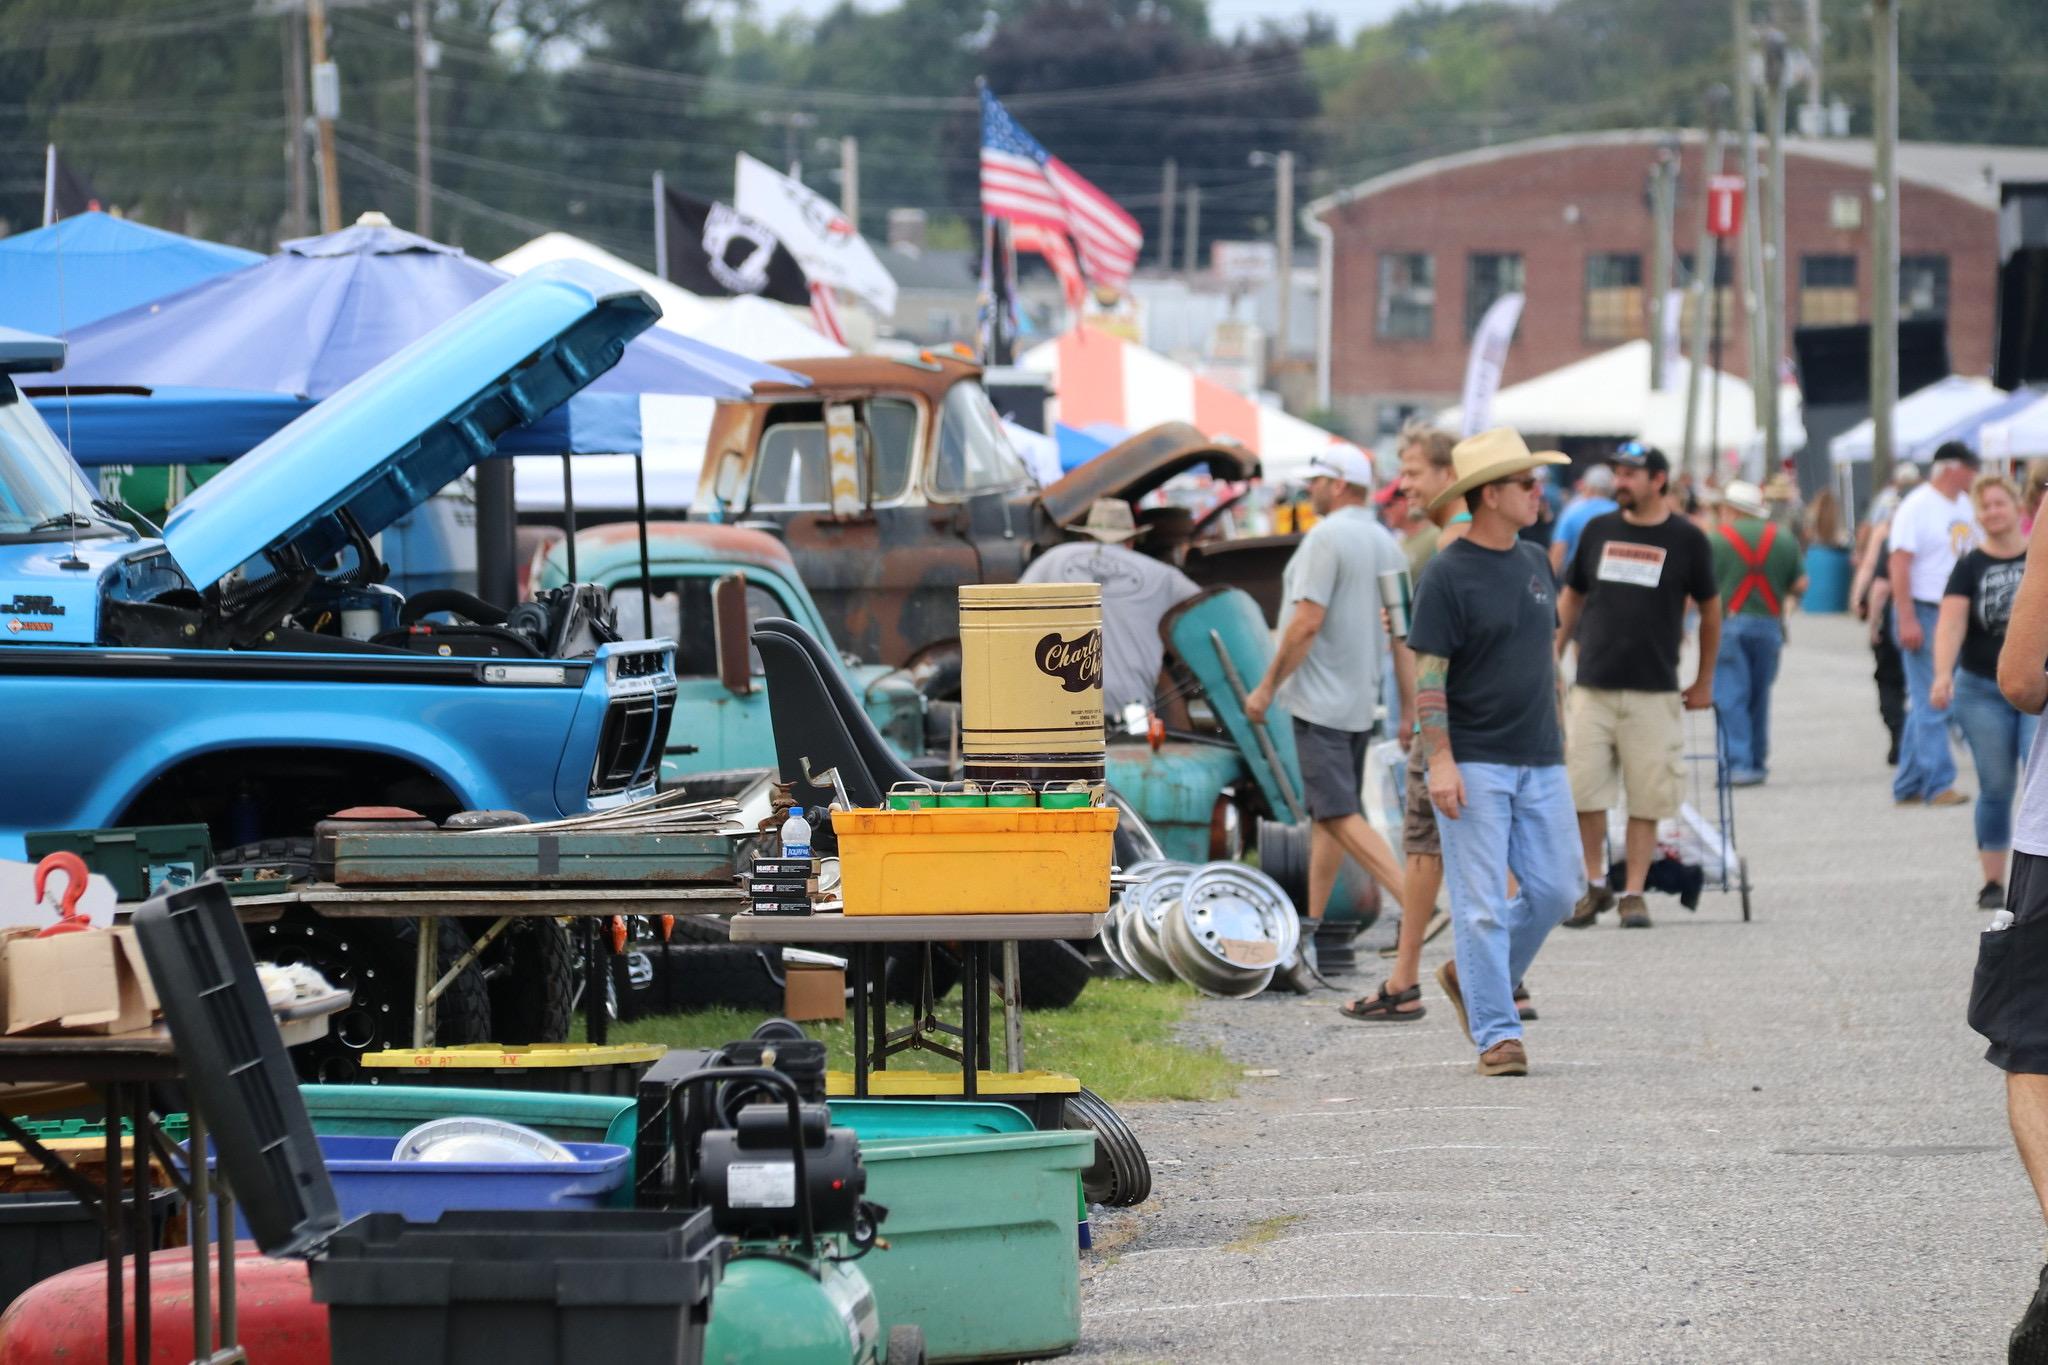 Carlisle Truck Nationals, Carlisle Truck Nationals provides 1,700 vehicle showcase, ClassicCars.com Journal